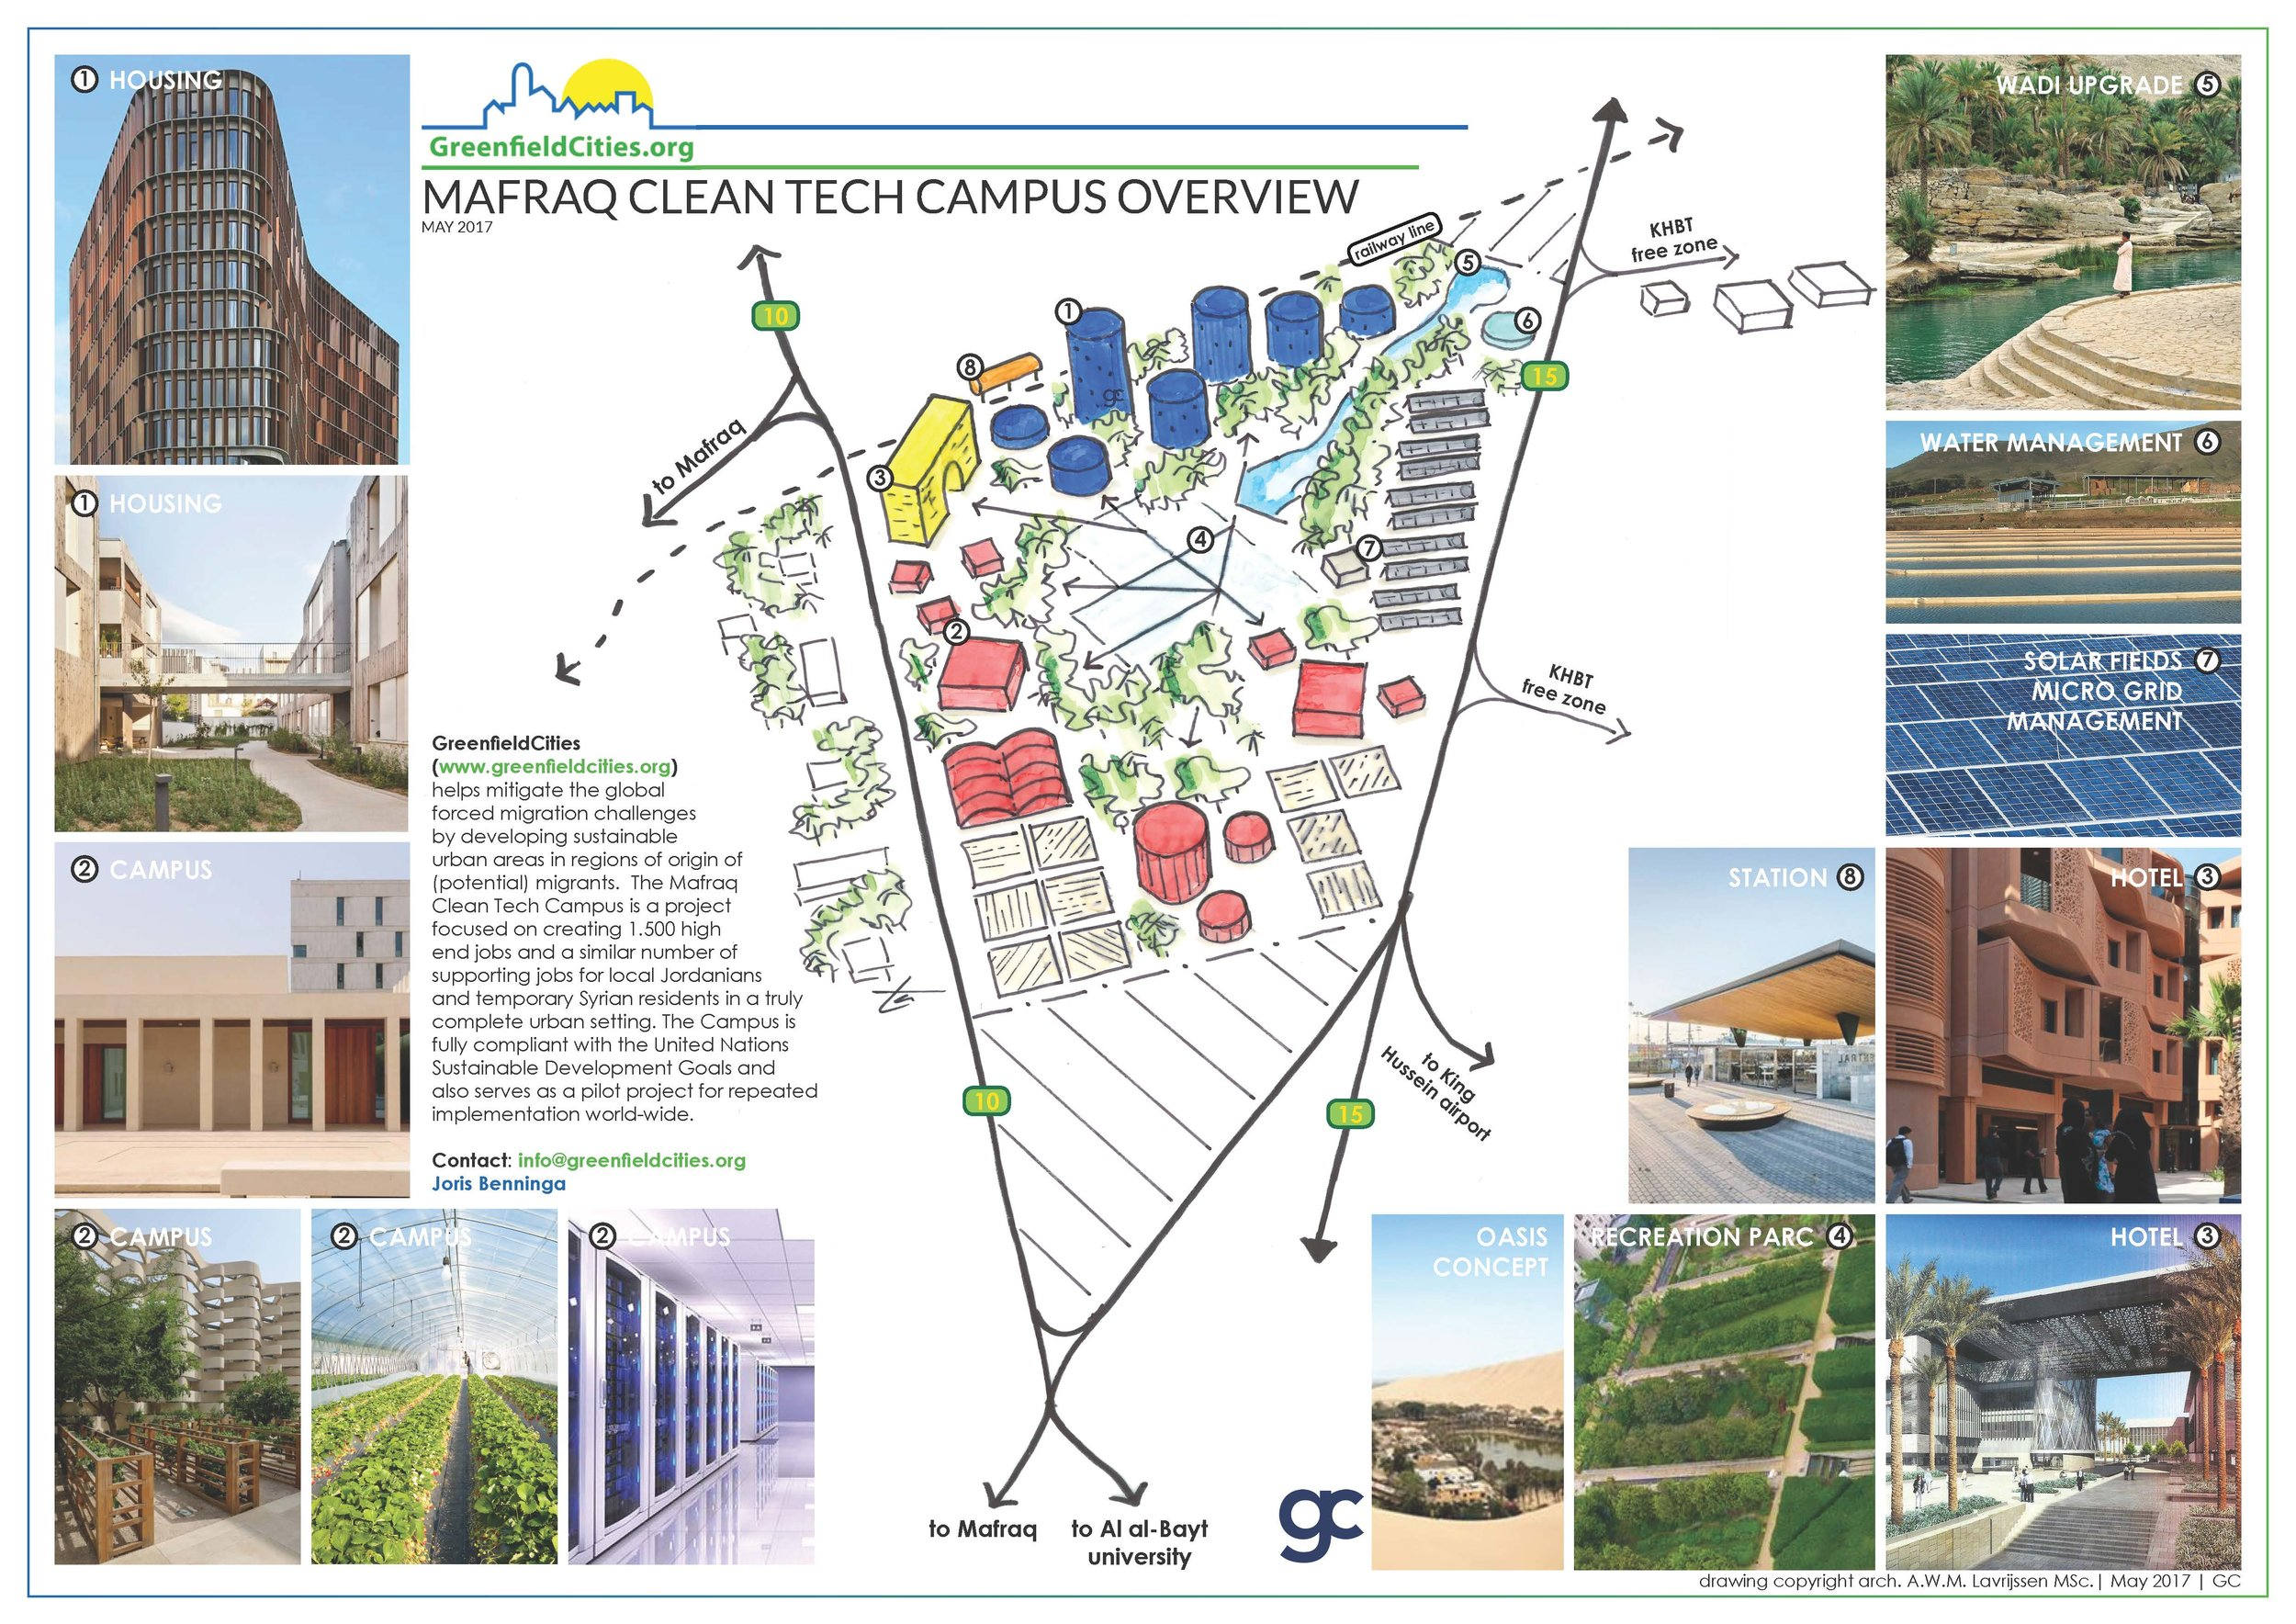 20170517 GreenField Cities concept (002).jpg